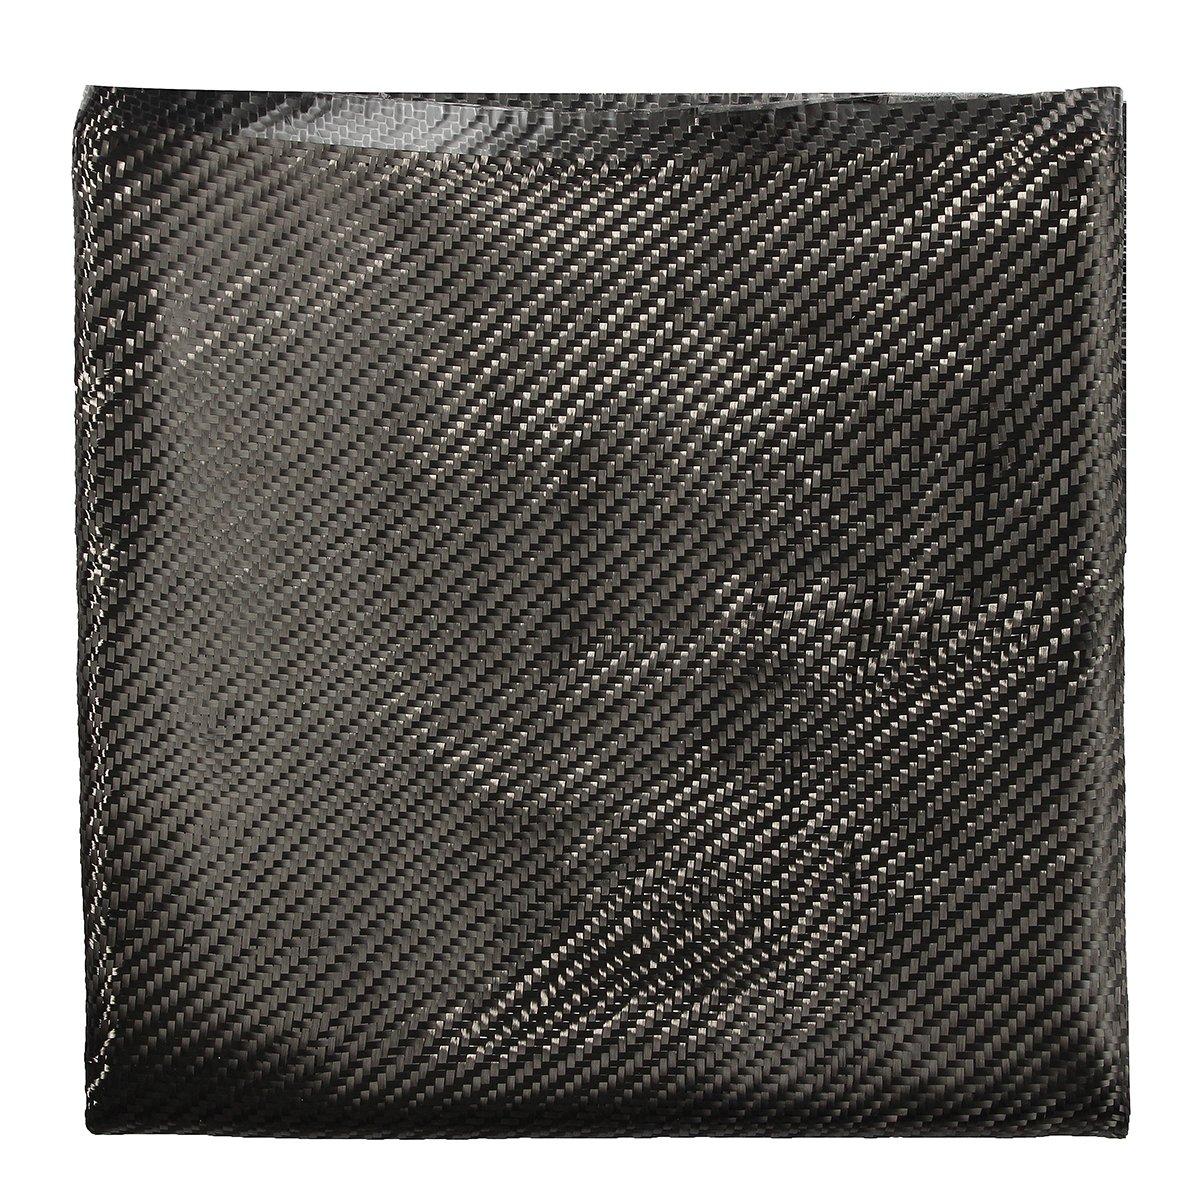 Hitommy 510x850mm 3K Carbon Fiber Cloth